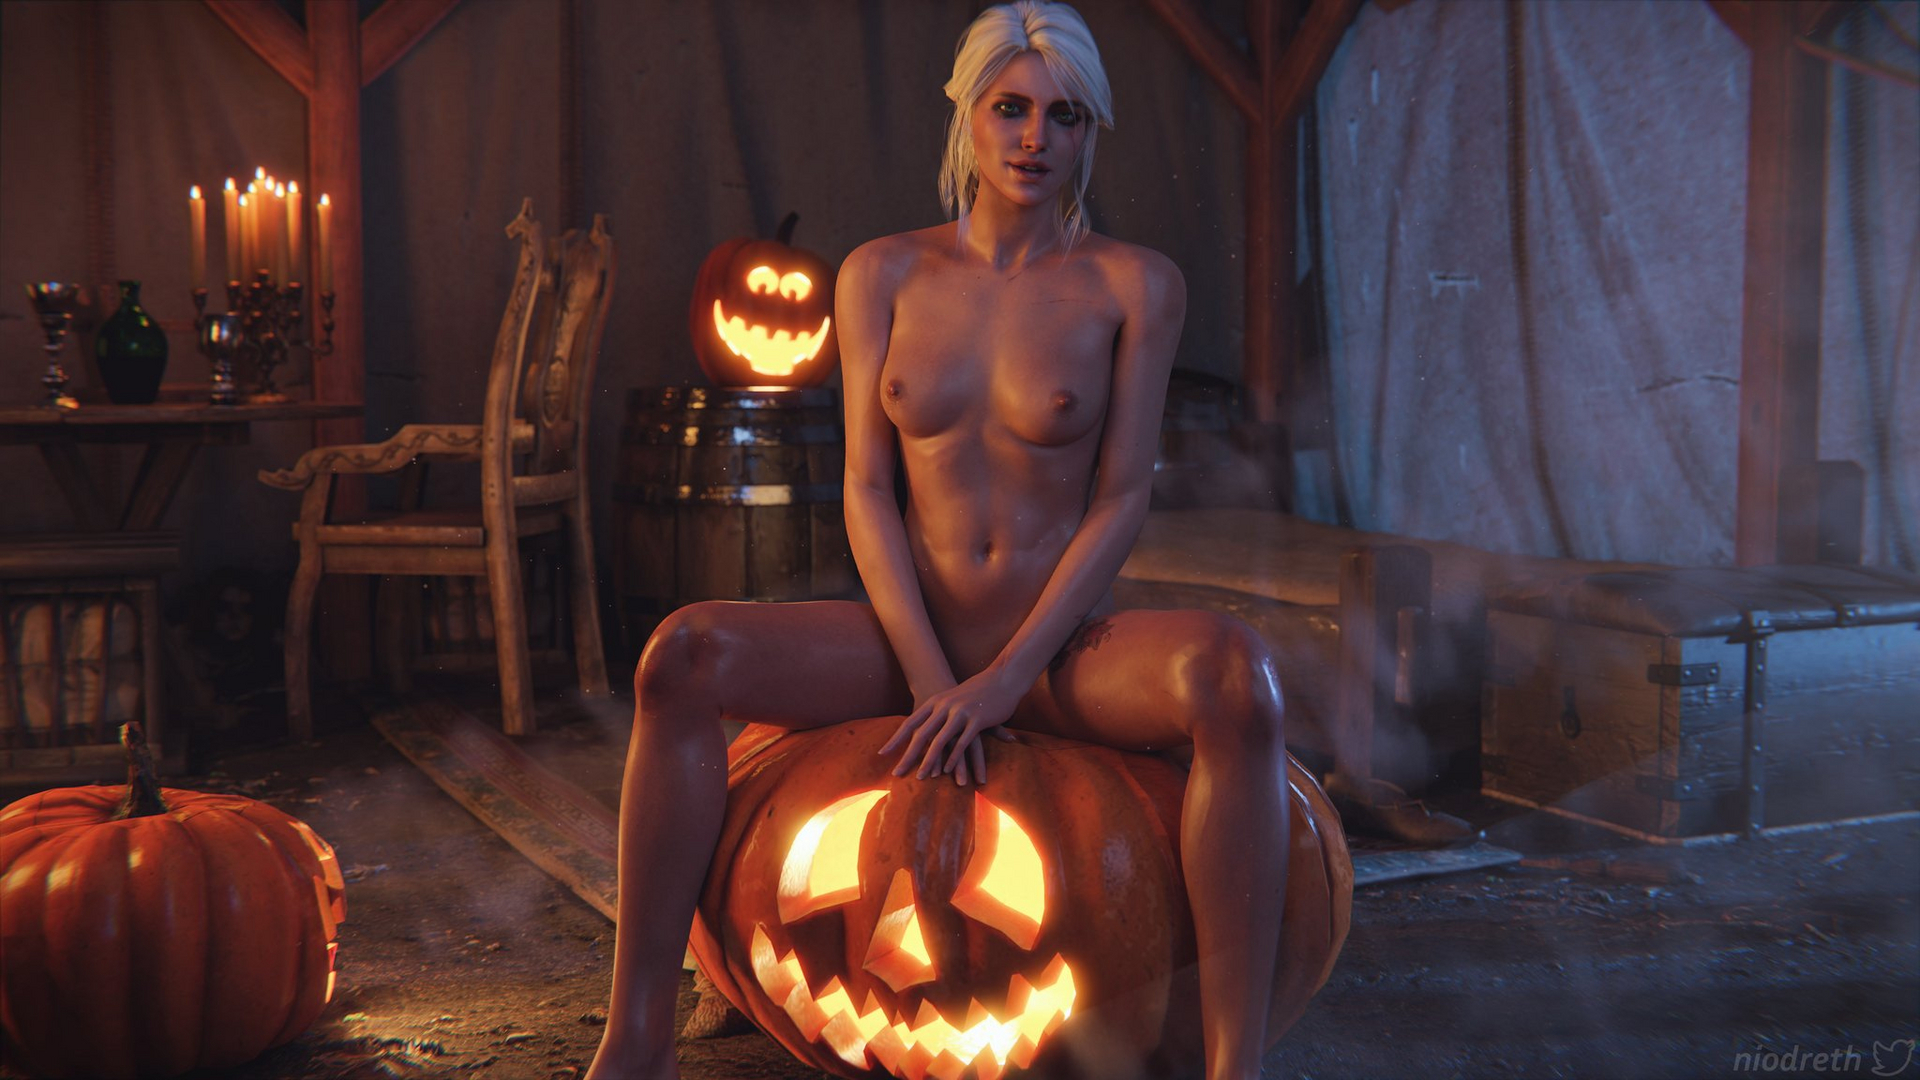 cirilla, ciri, the witcher 3, the witcher